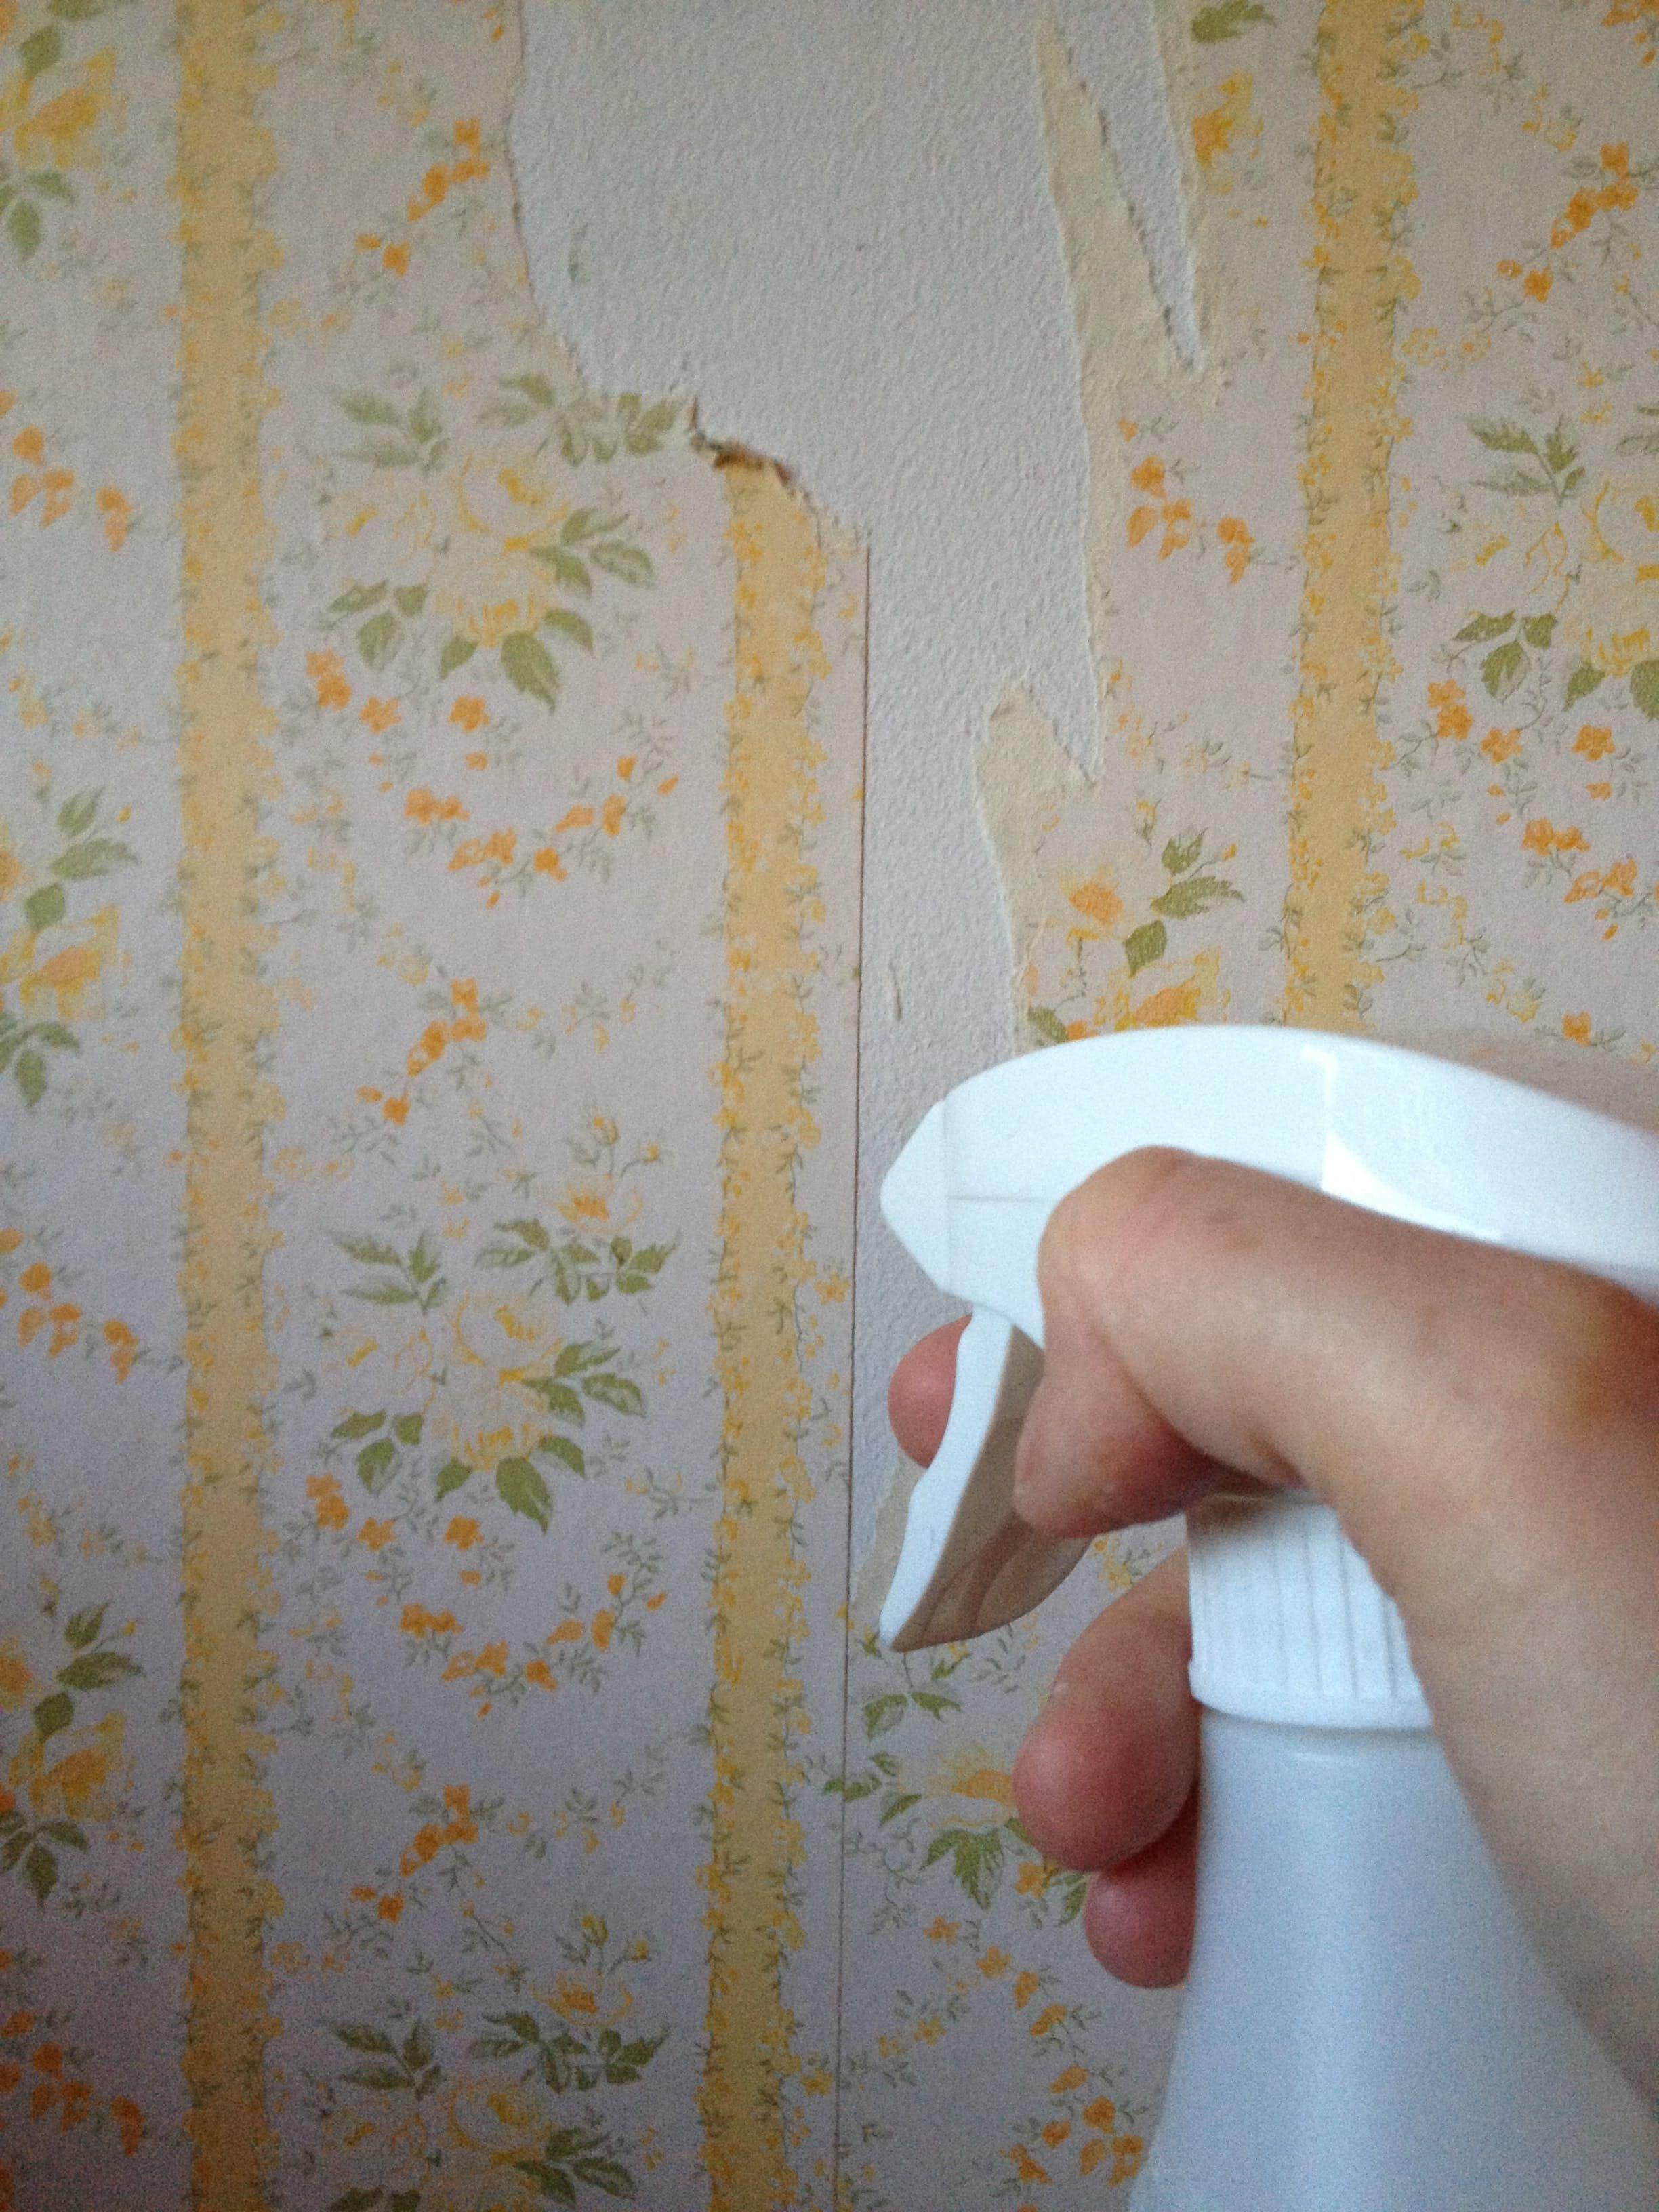 Astuce Pour Décoller Du Papier Peint easy & all natural wallpaper removal tip: use vinegar and